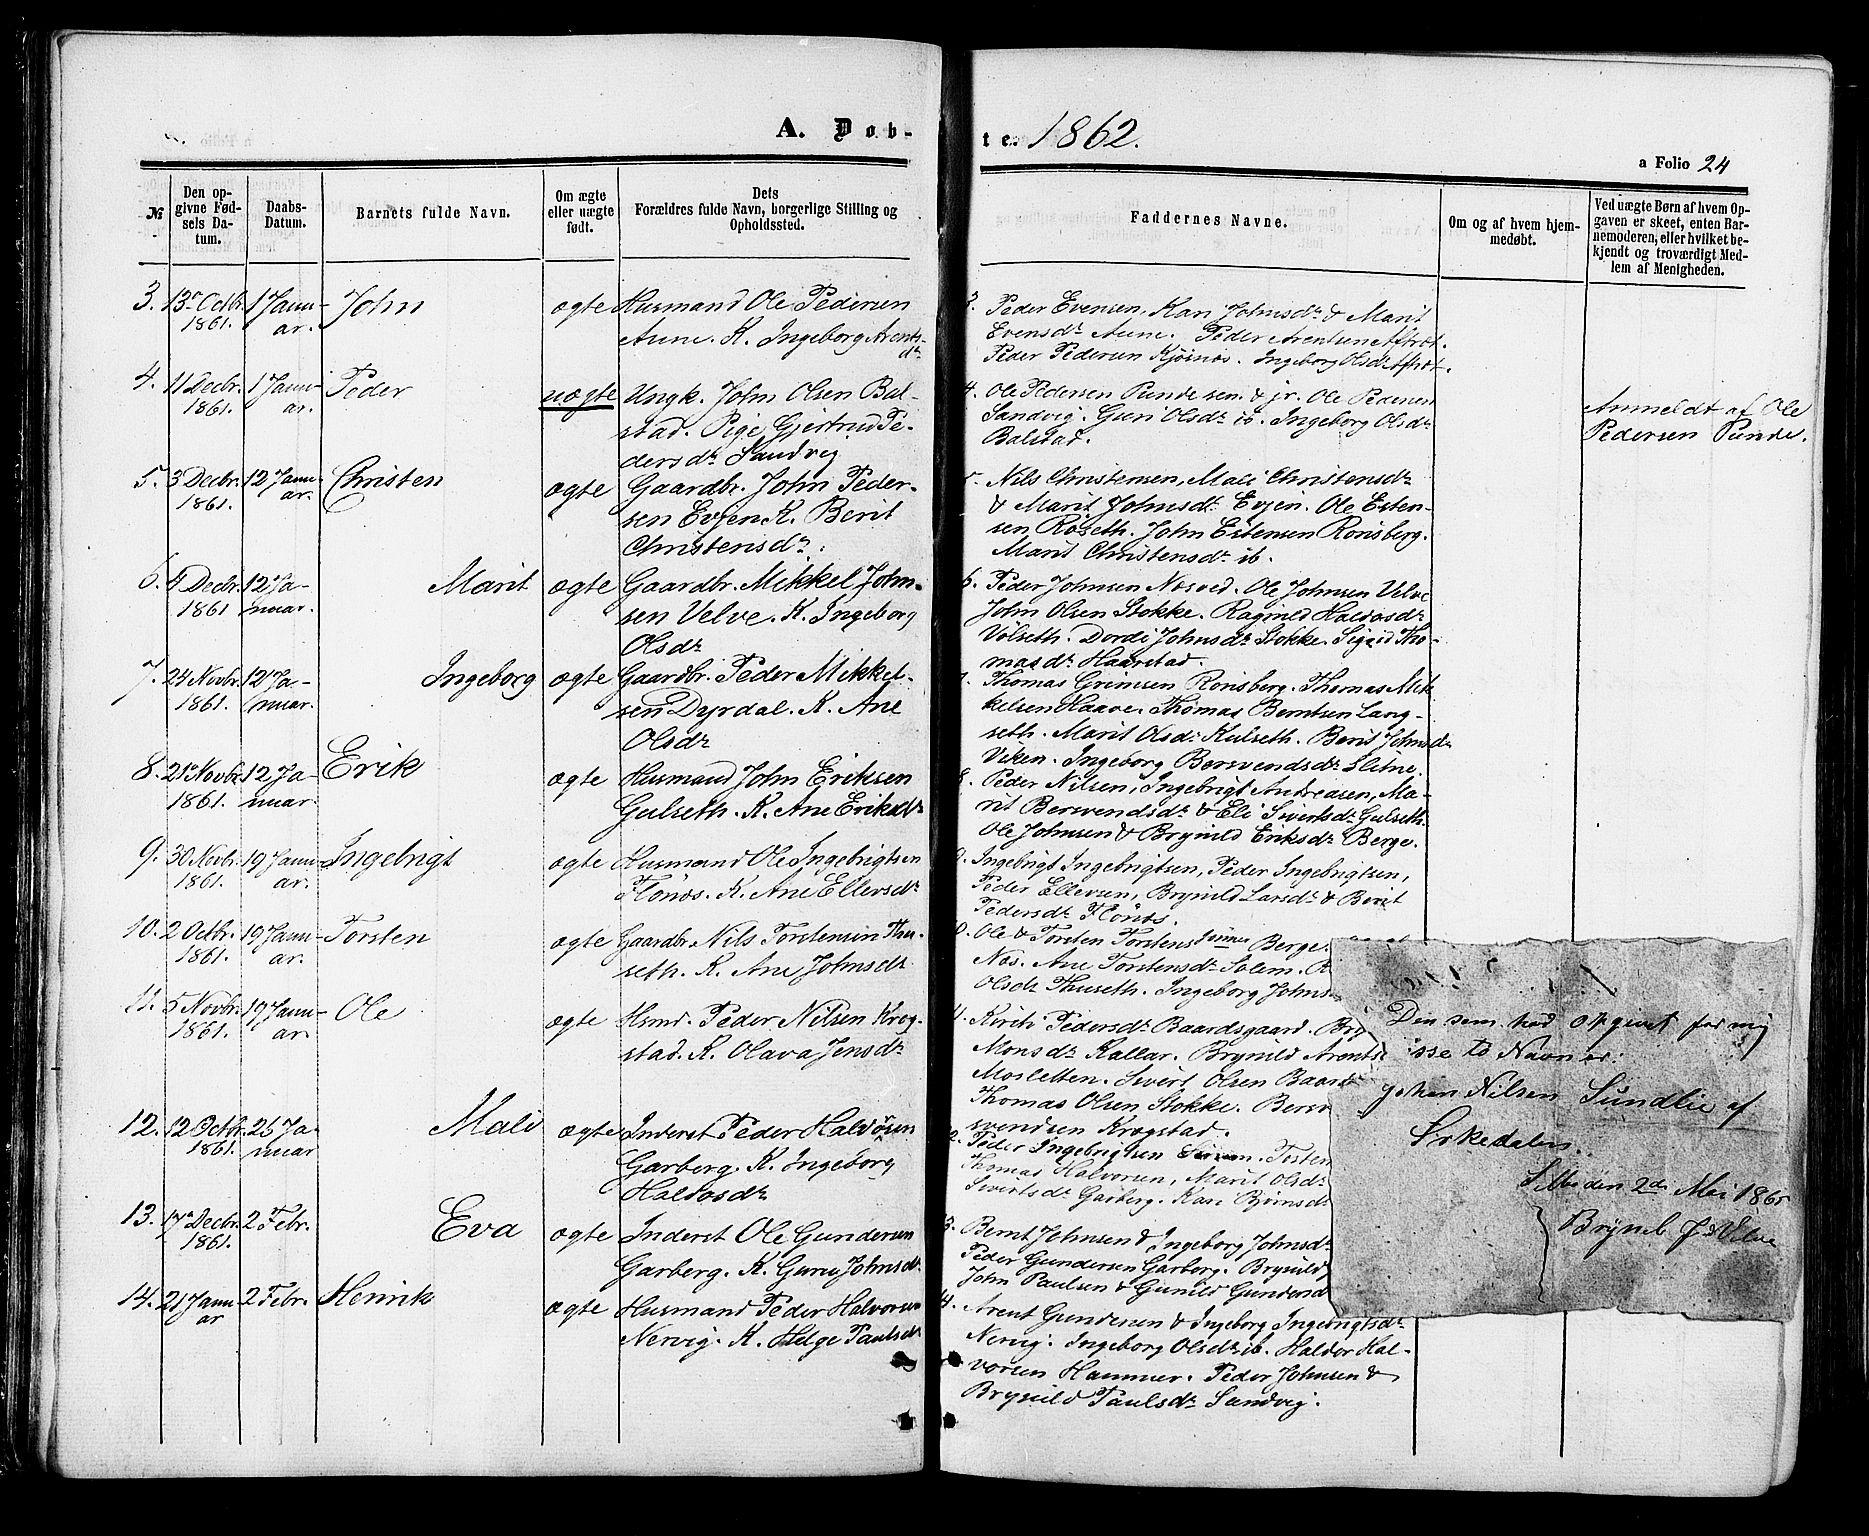 SAT, Ministerialprotokoller, klokkerbøker og fødselsregistre - Sør-Trøndelag, 695/L1147: Parish register (official) no. 695A07, 1860-1877, p. 24